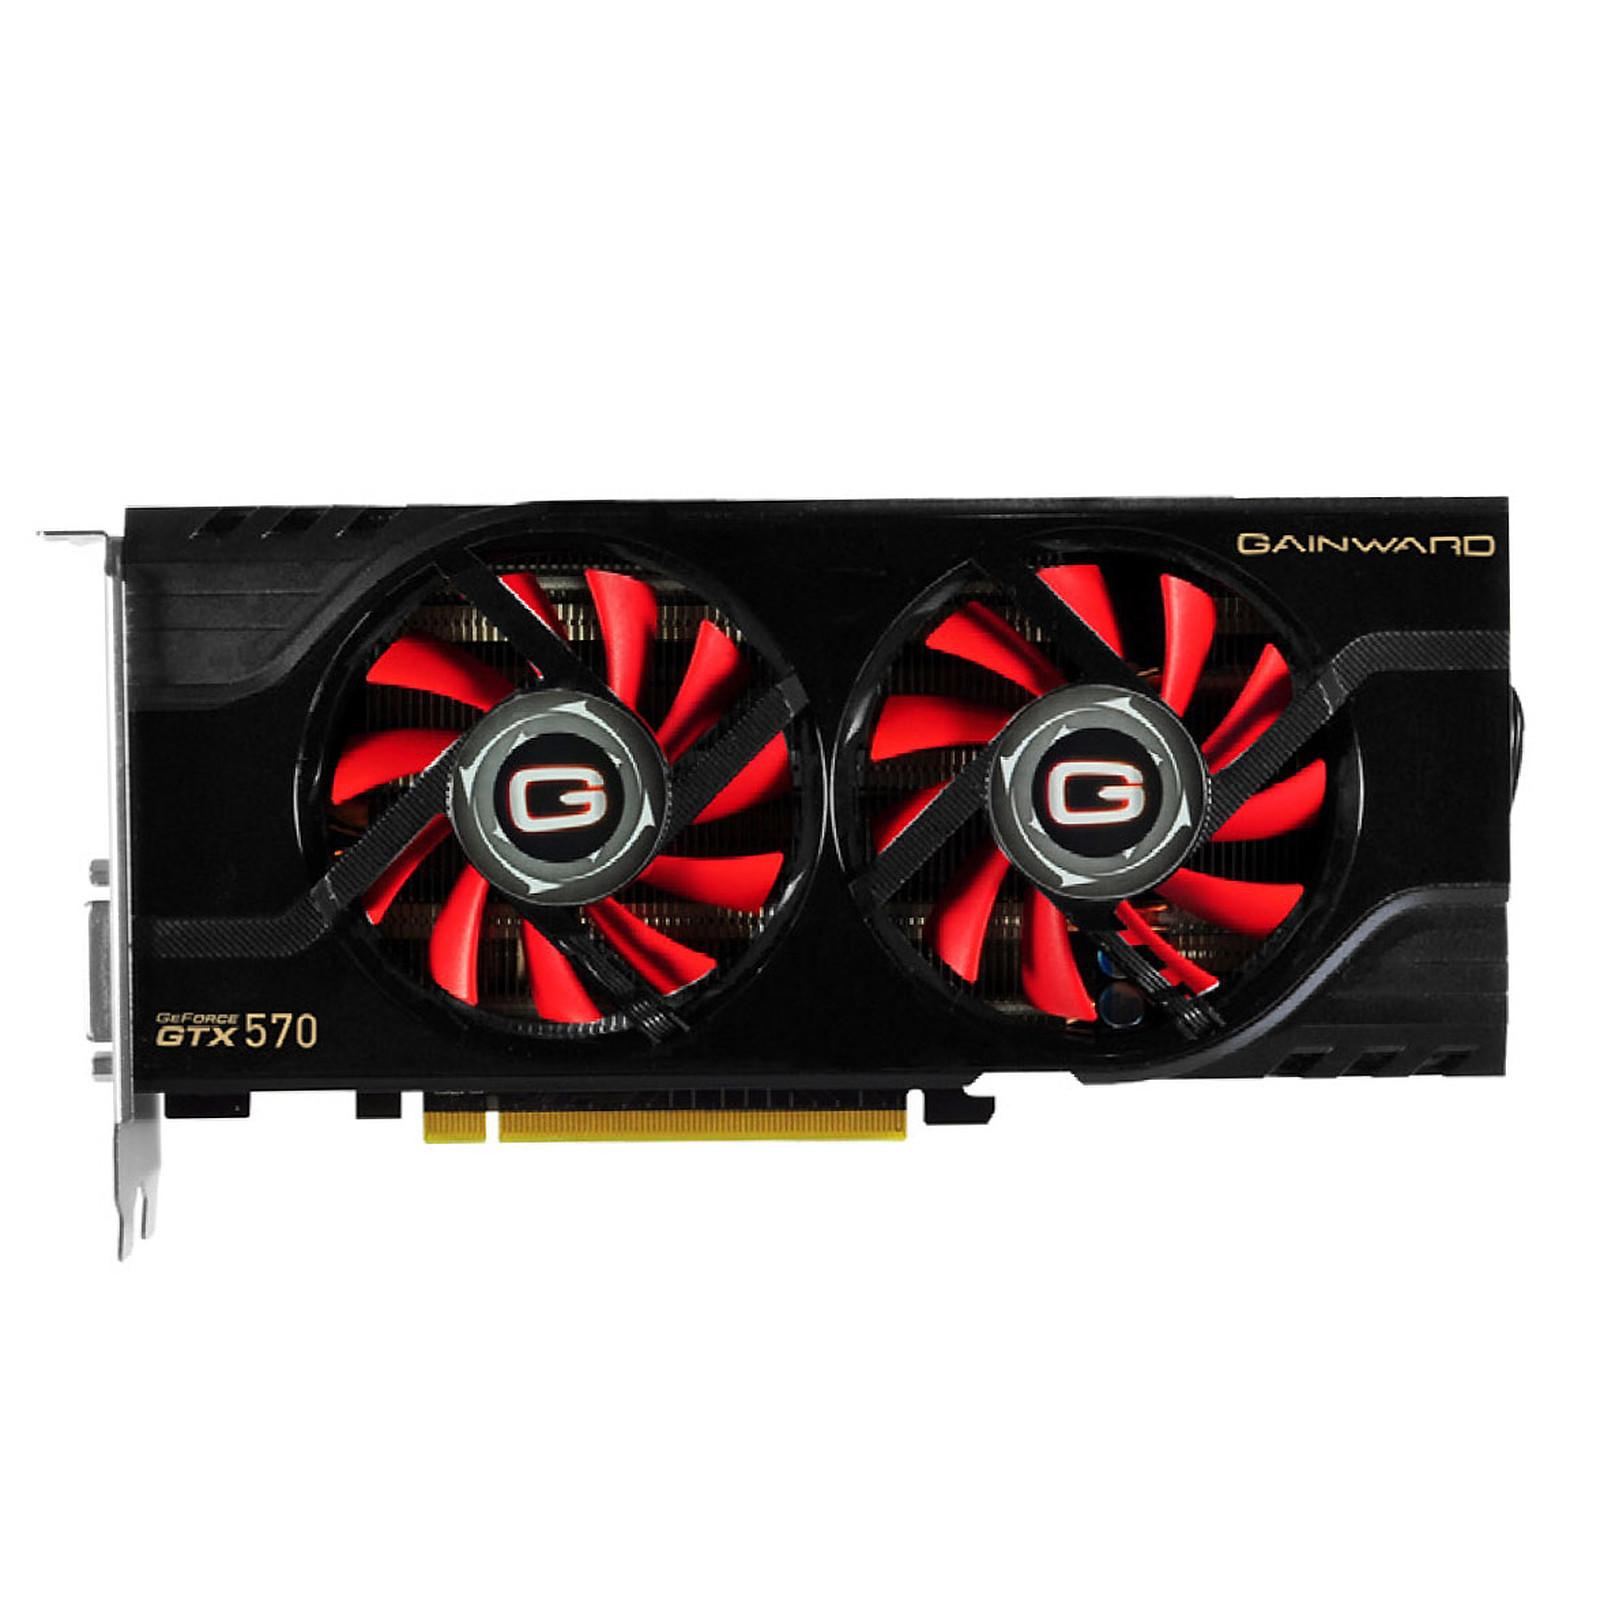 Gainward GeForce GTX 570 1280 MB DisplayPort